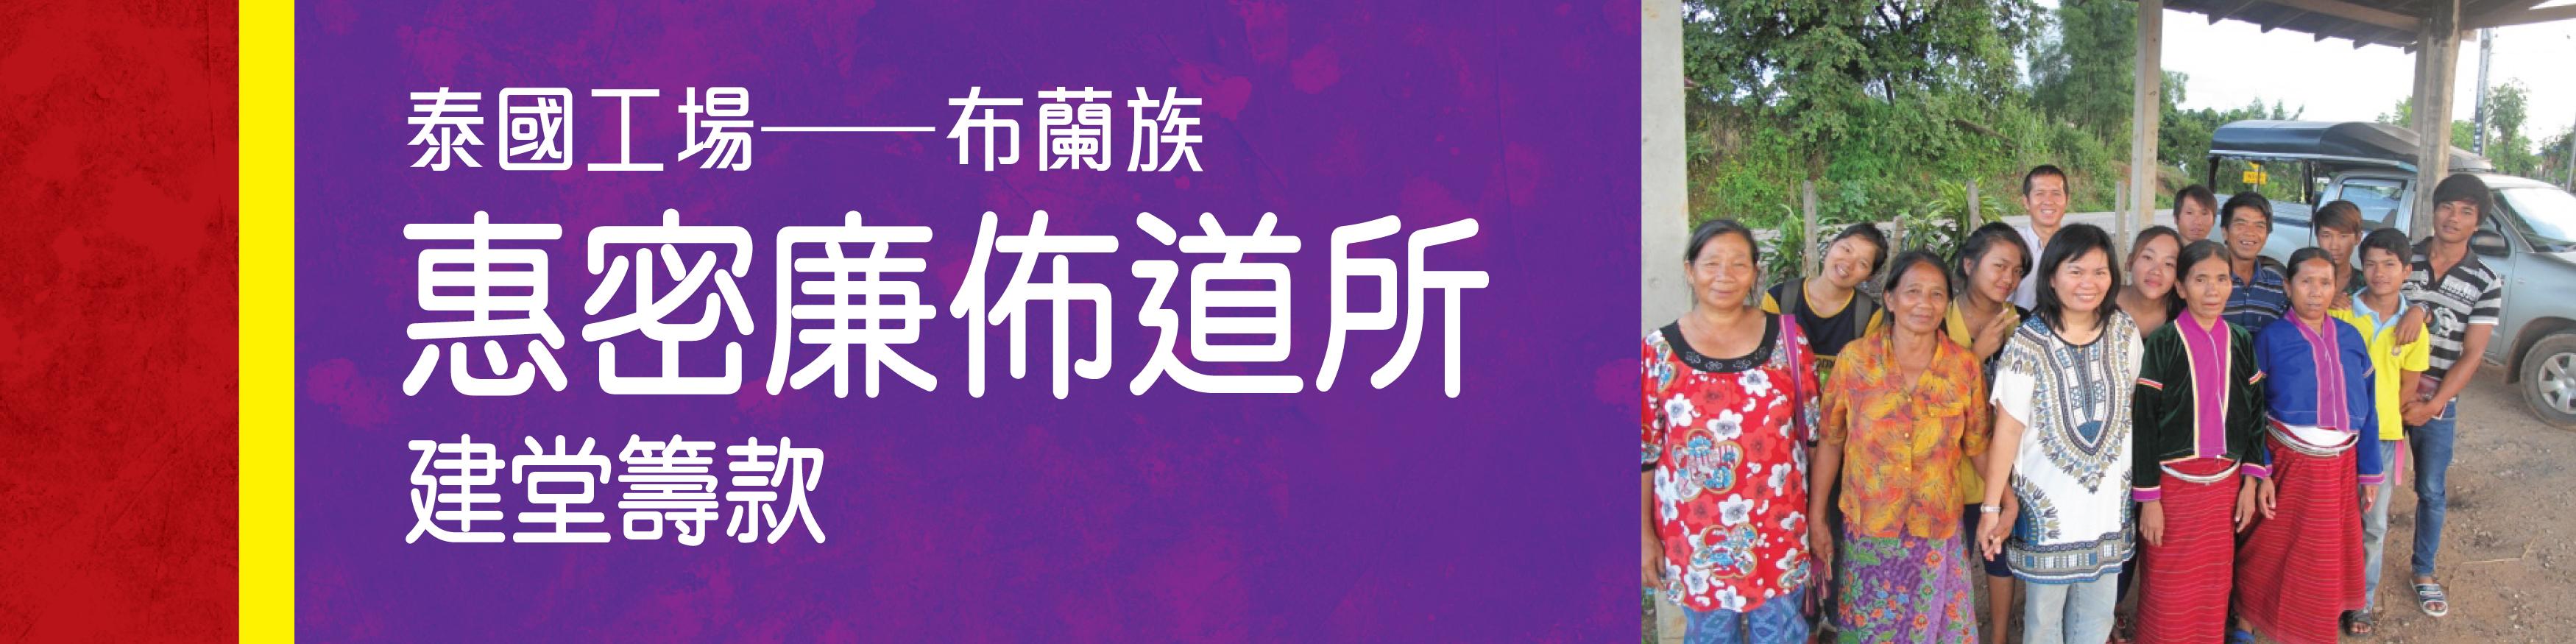 CB-02-web-banner-1680-x-420-012